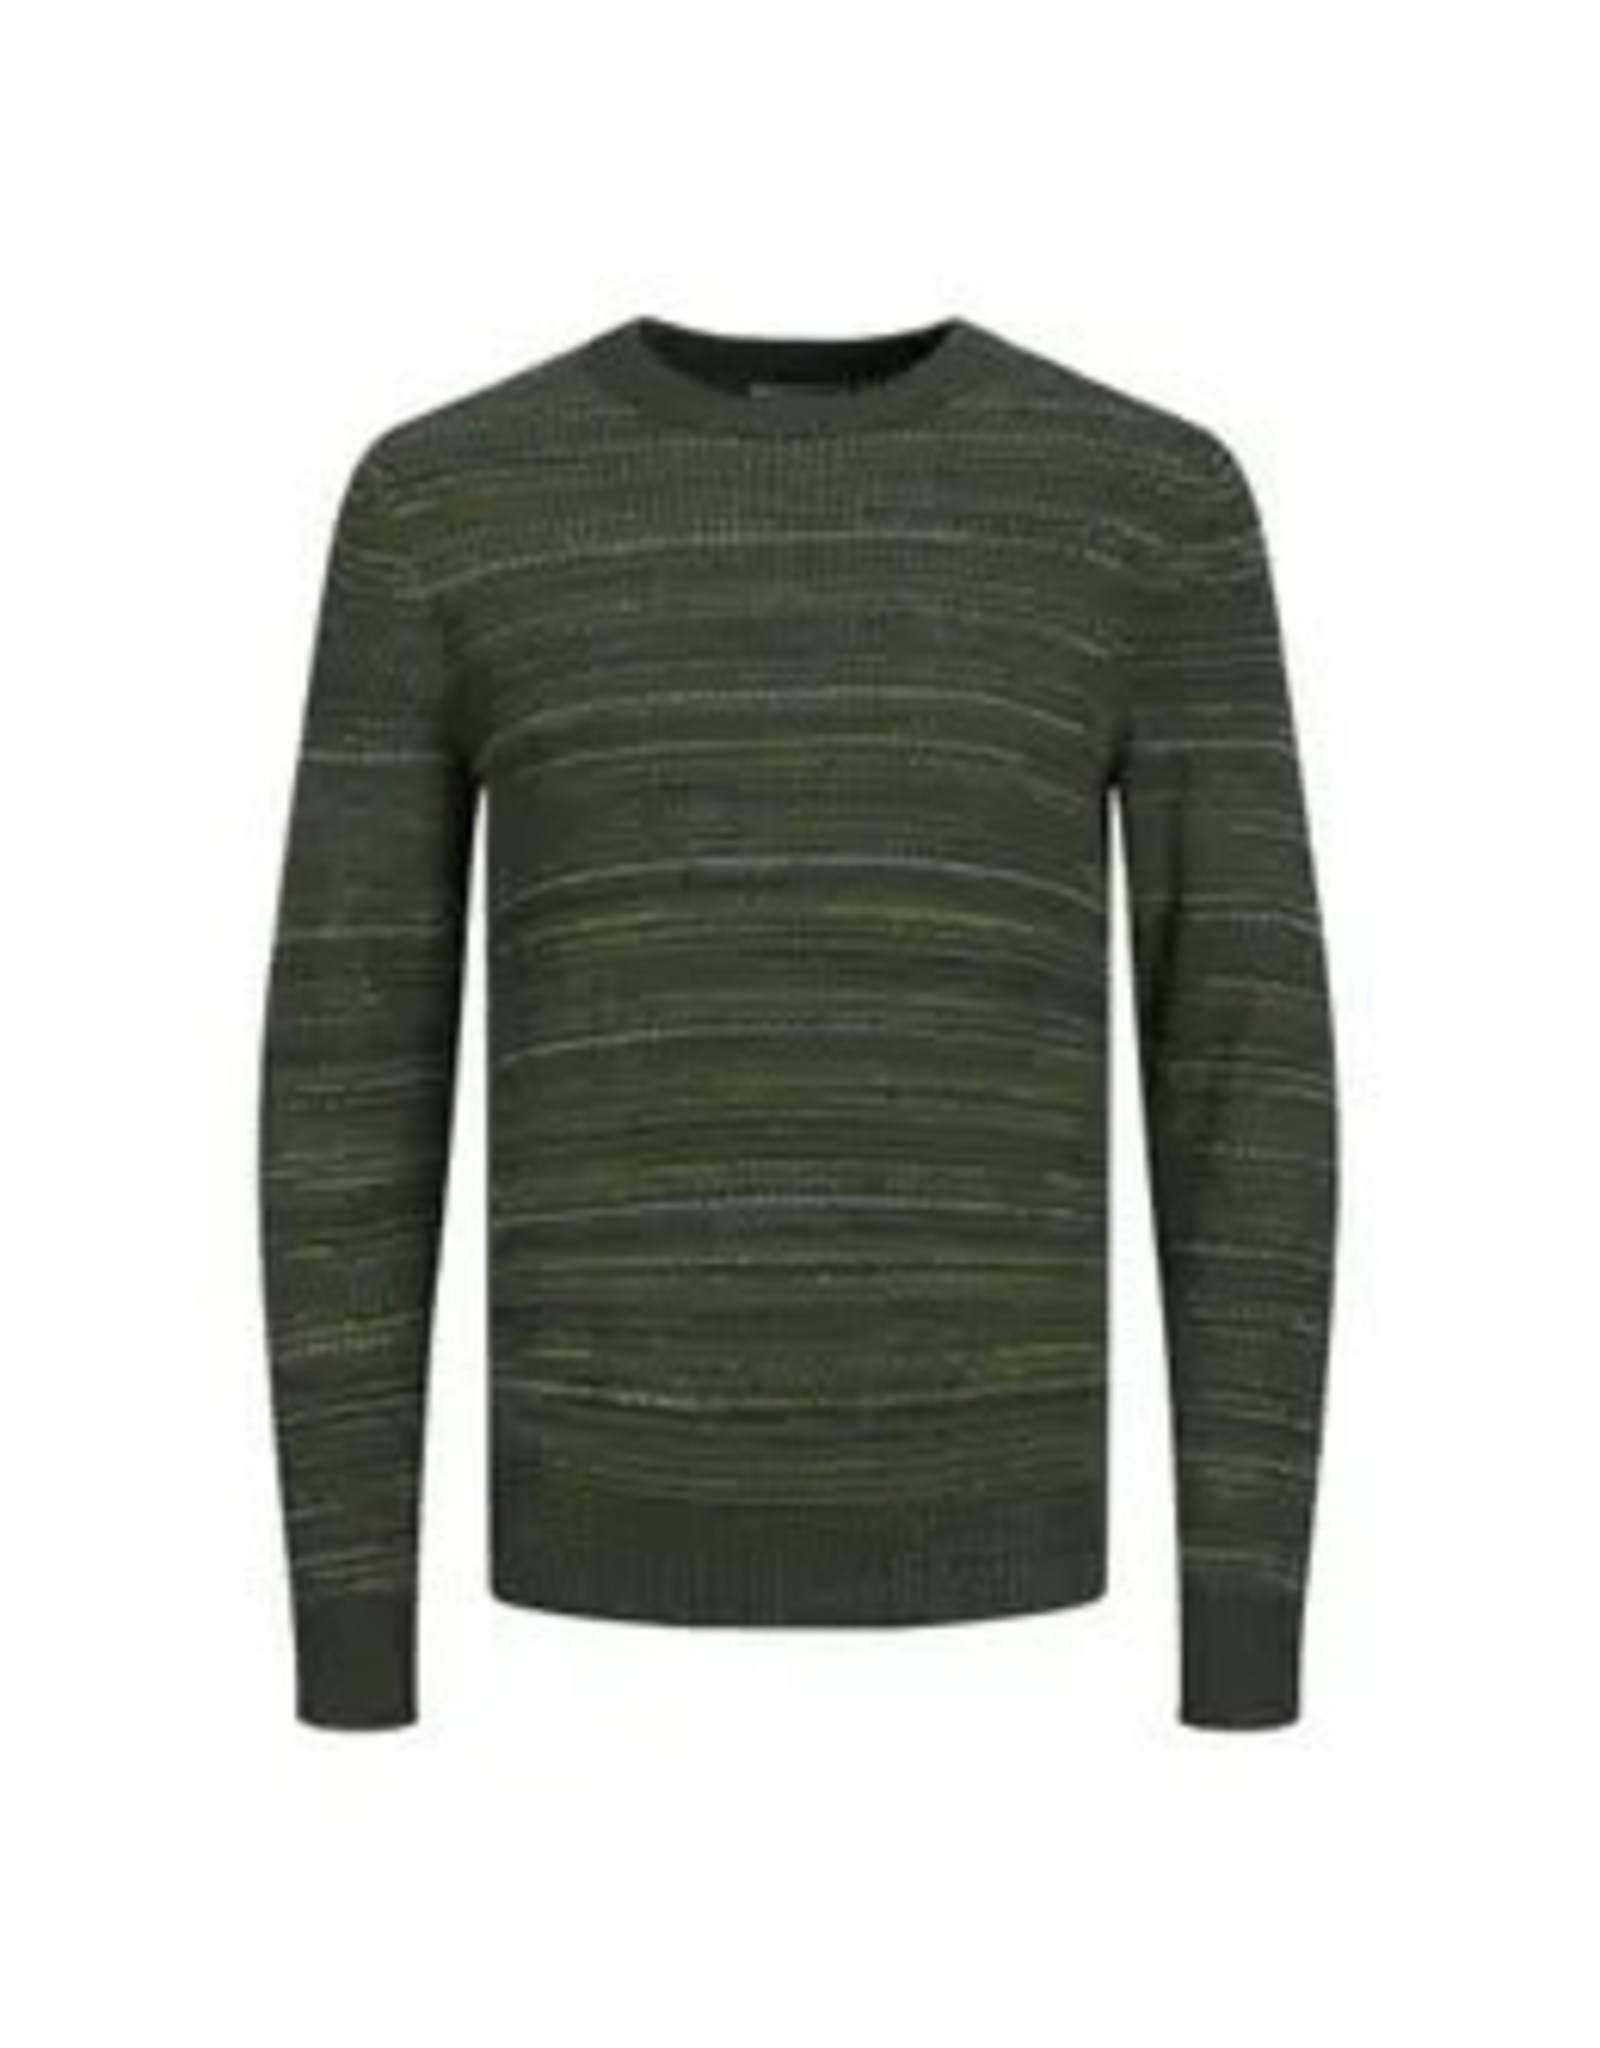 '76 Mens Mercantile Knit Crew Neck Sweater